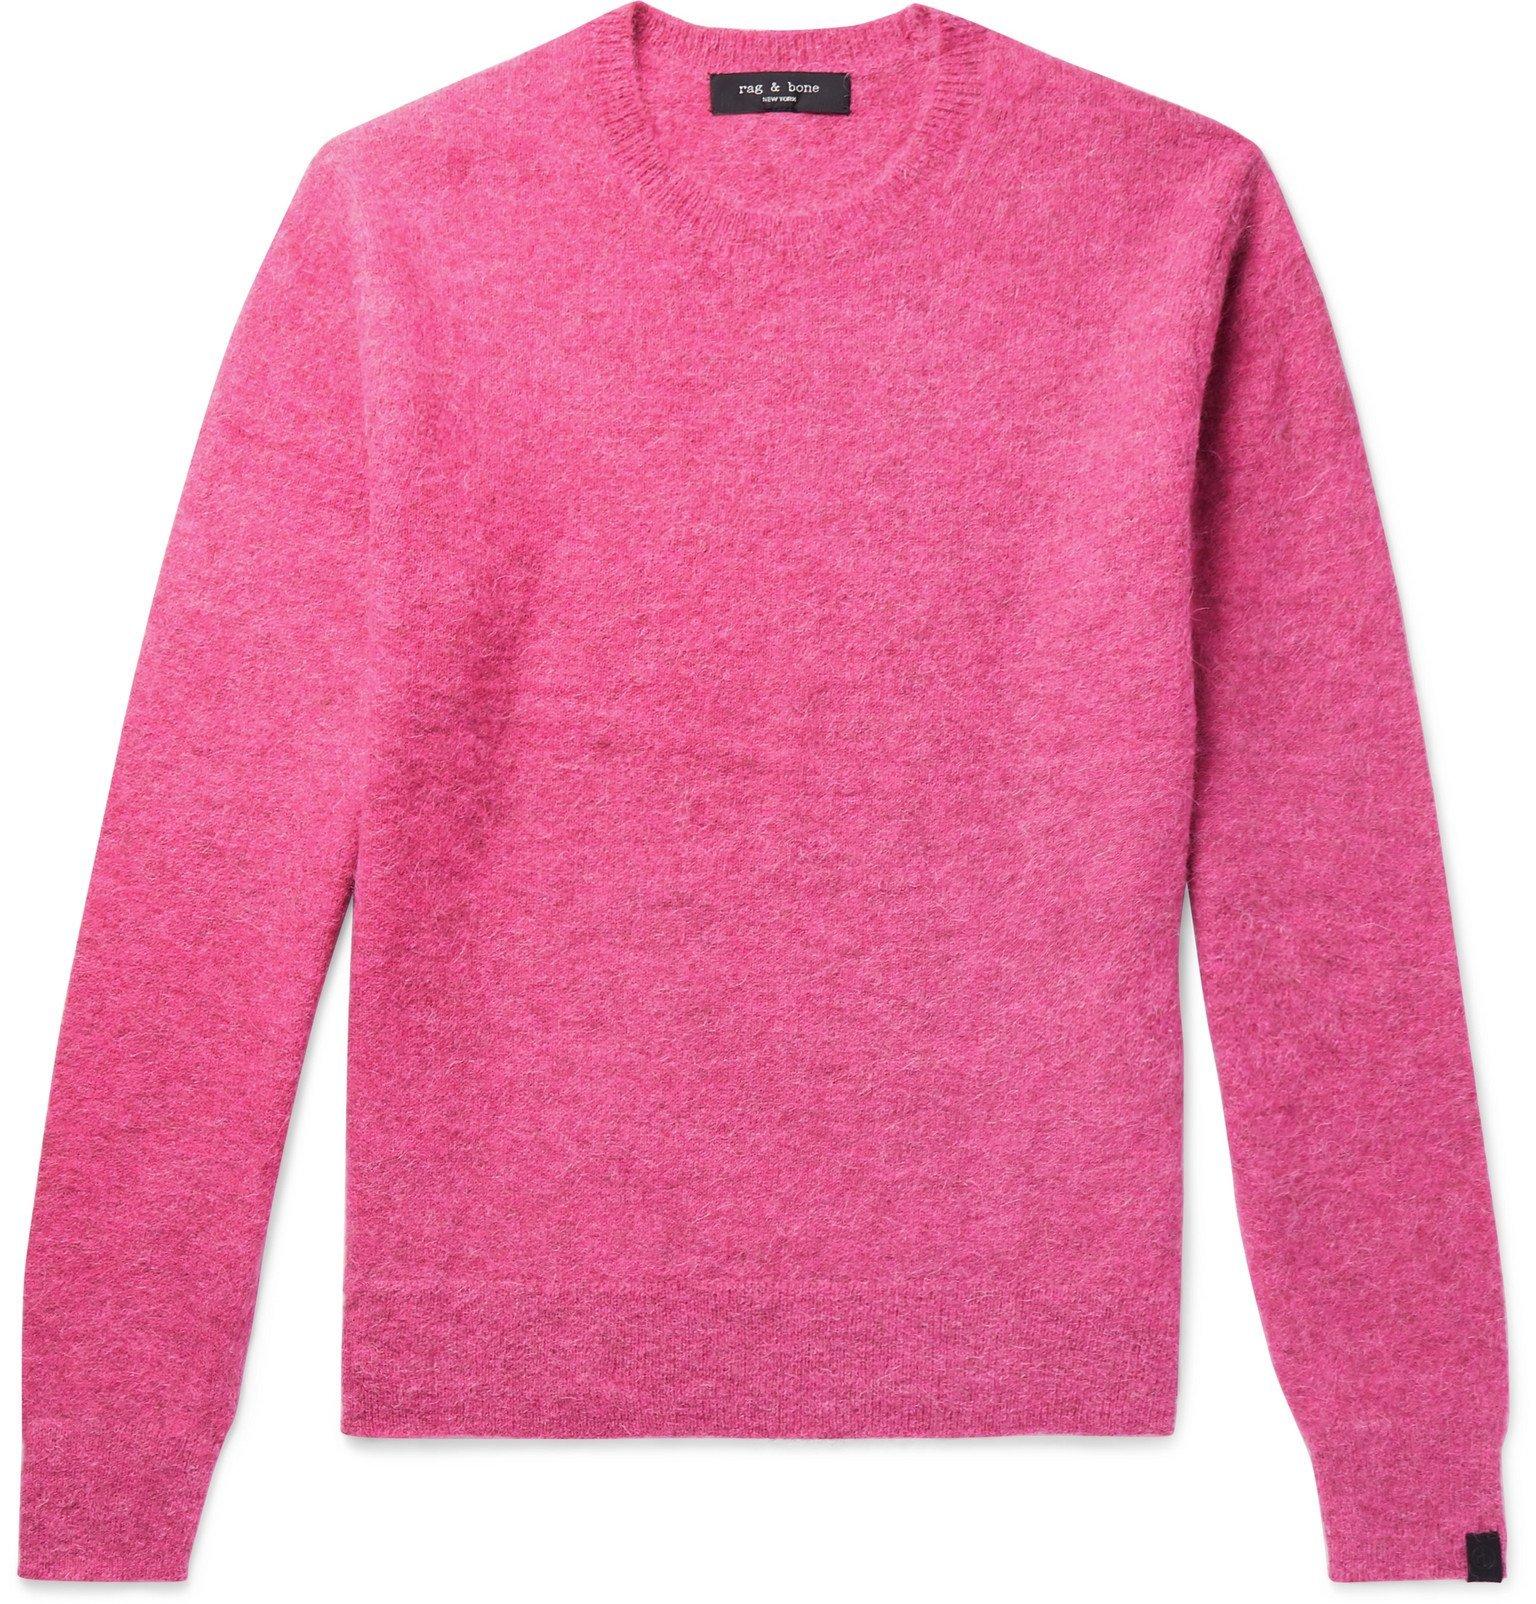 Photo: rag & bone - Arnie Alpaca-Blend Sweater - Pink